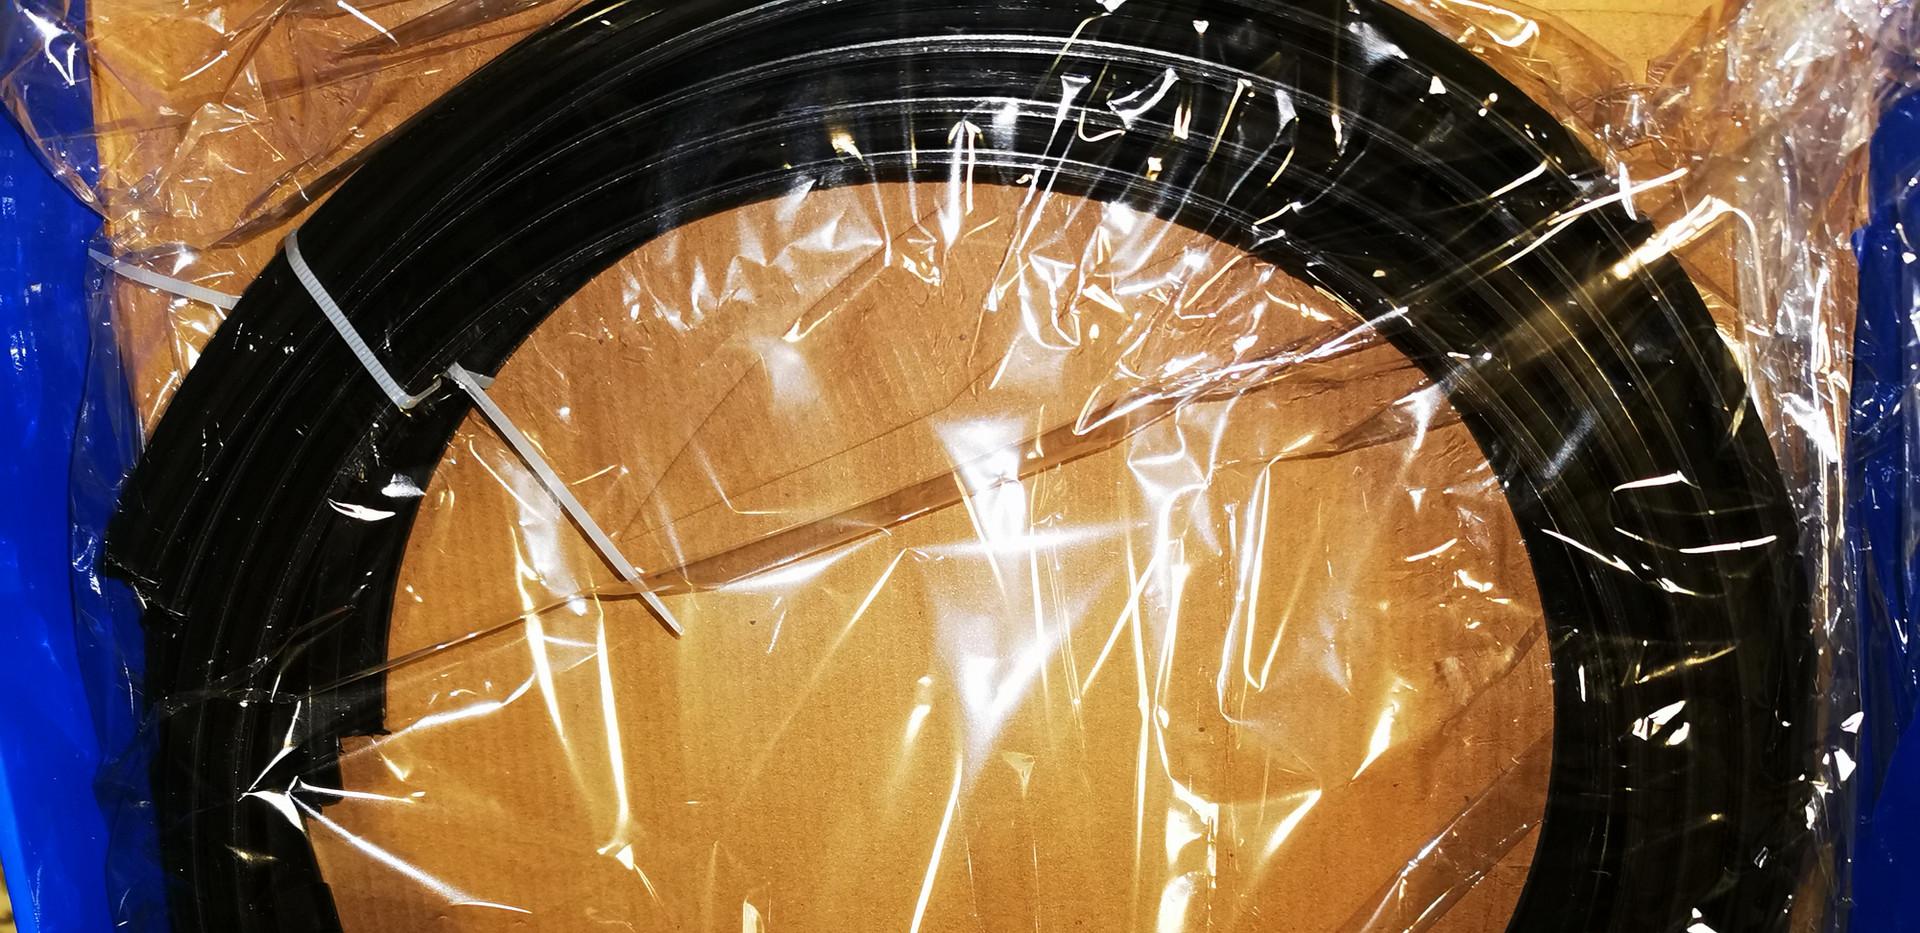 Black Alloy wheel / Rims protector